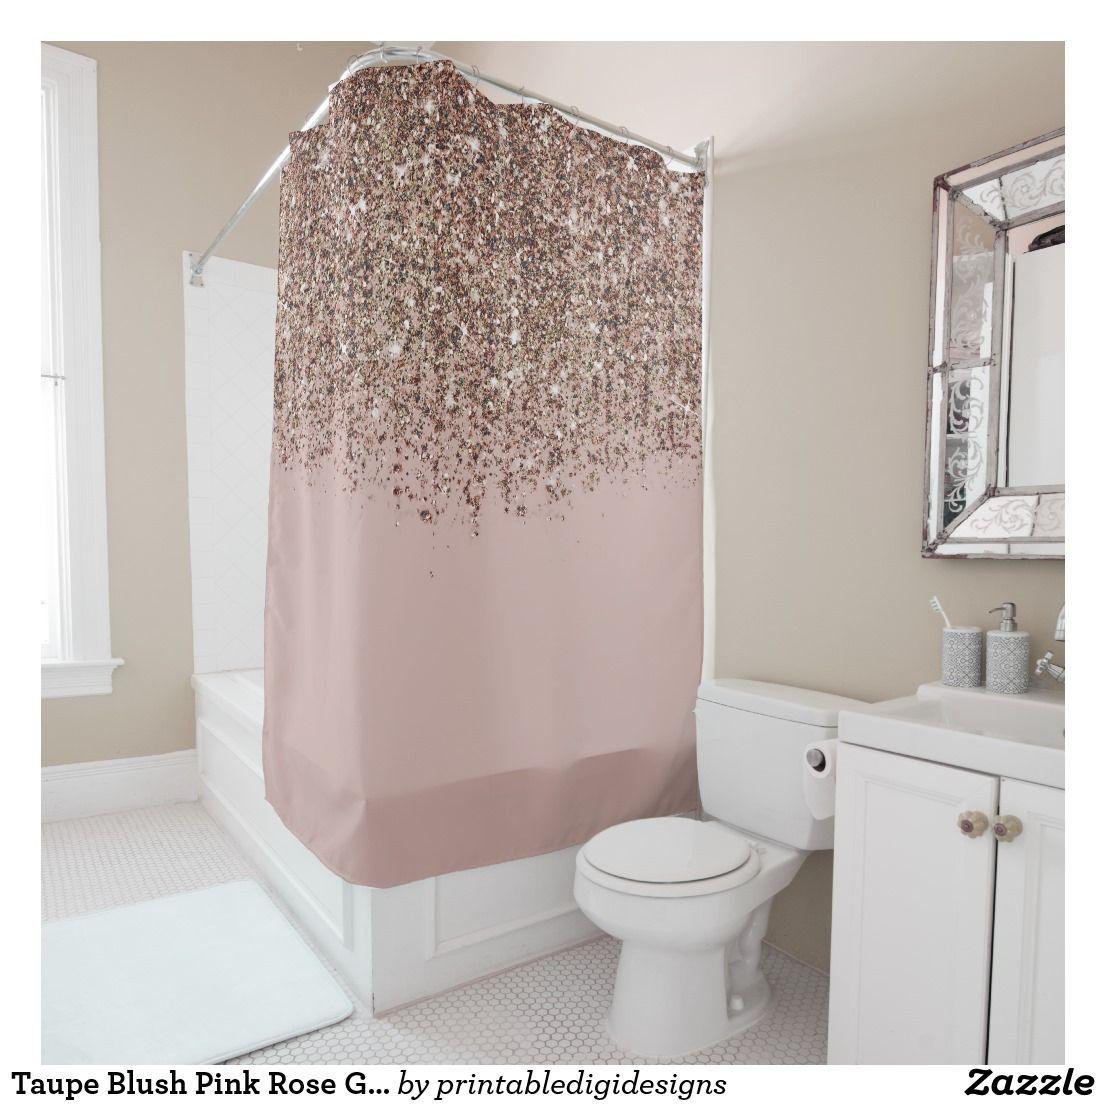 Taupe Blush Pink Rose Gold Bronze Glitter Glam Shower Curtain Zazzle Com Pink Shower Curtains Pink Bathroom Decor Glam Bedroom Decor